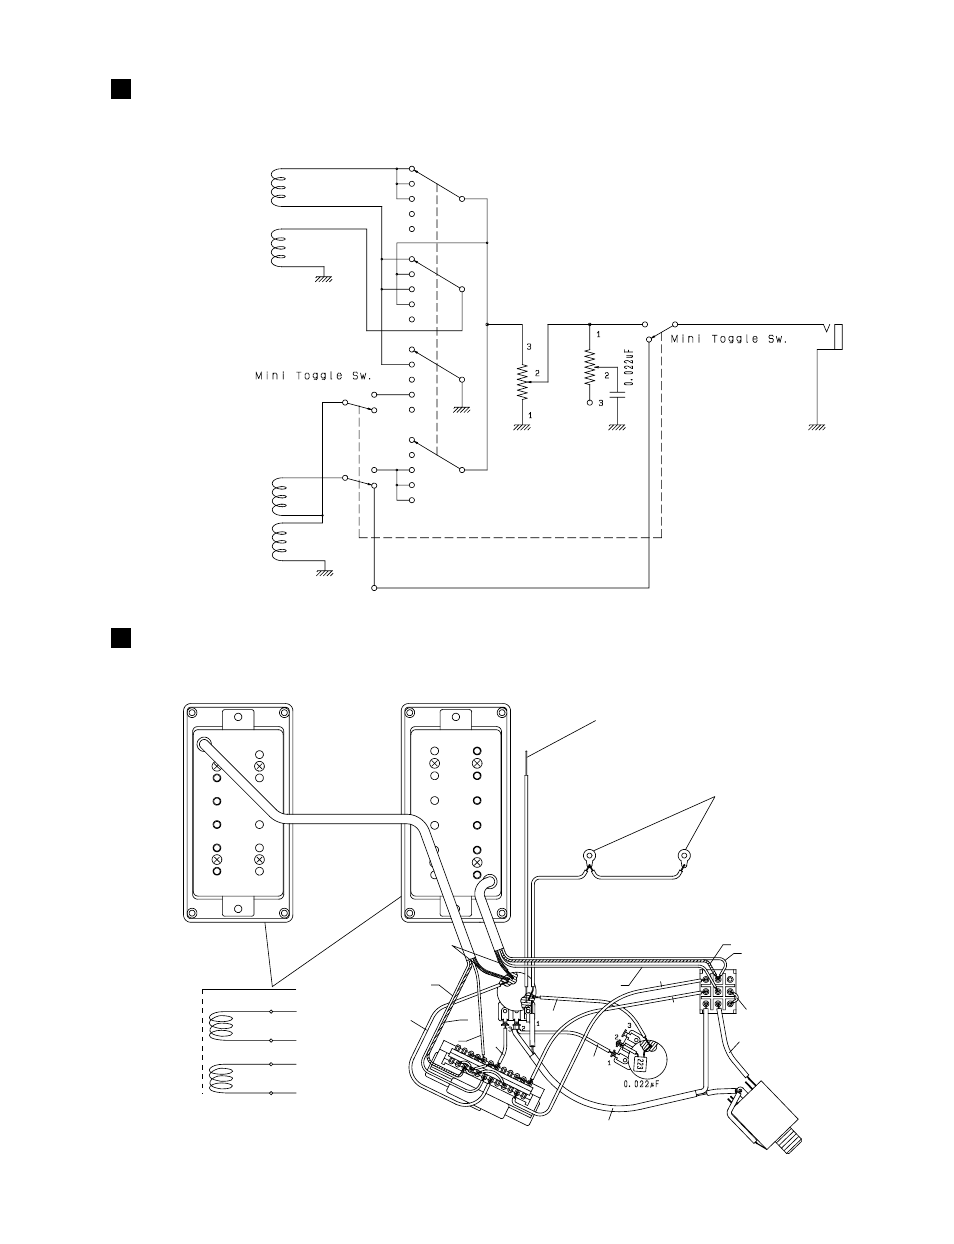 yamaha electric guitar rgx 420s page5?resize\\\=665%2C867 easy rider wiring diagram wiring diagram simonand easy rider wiring diagram at soozxer.org